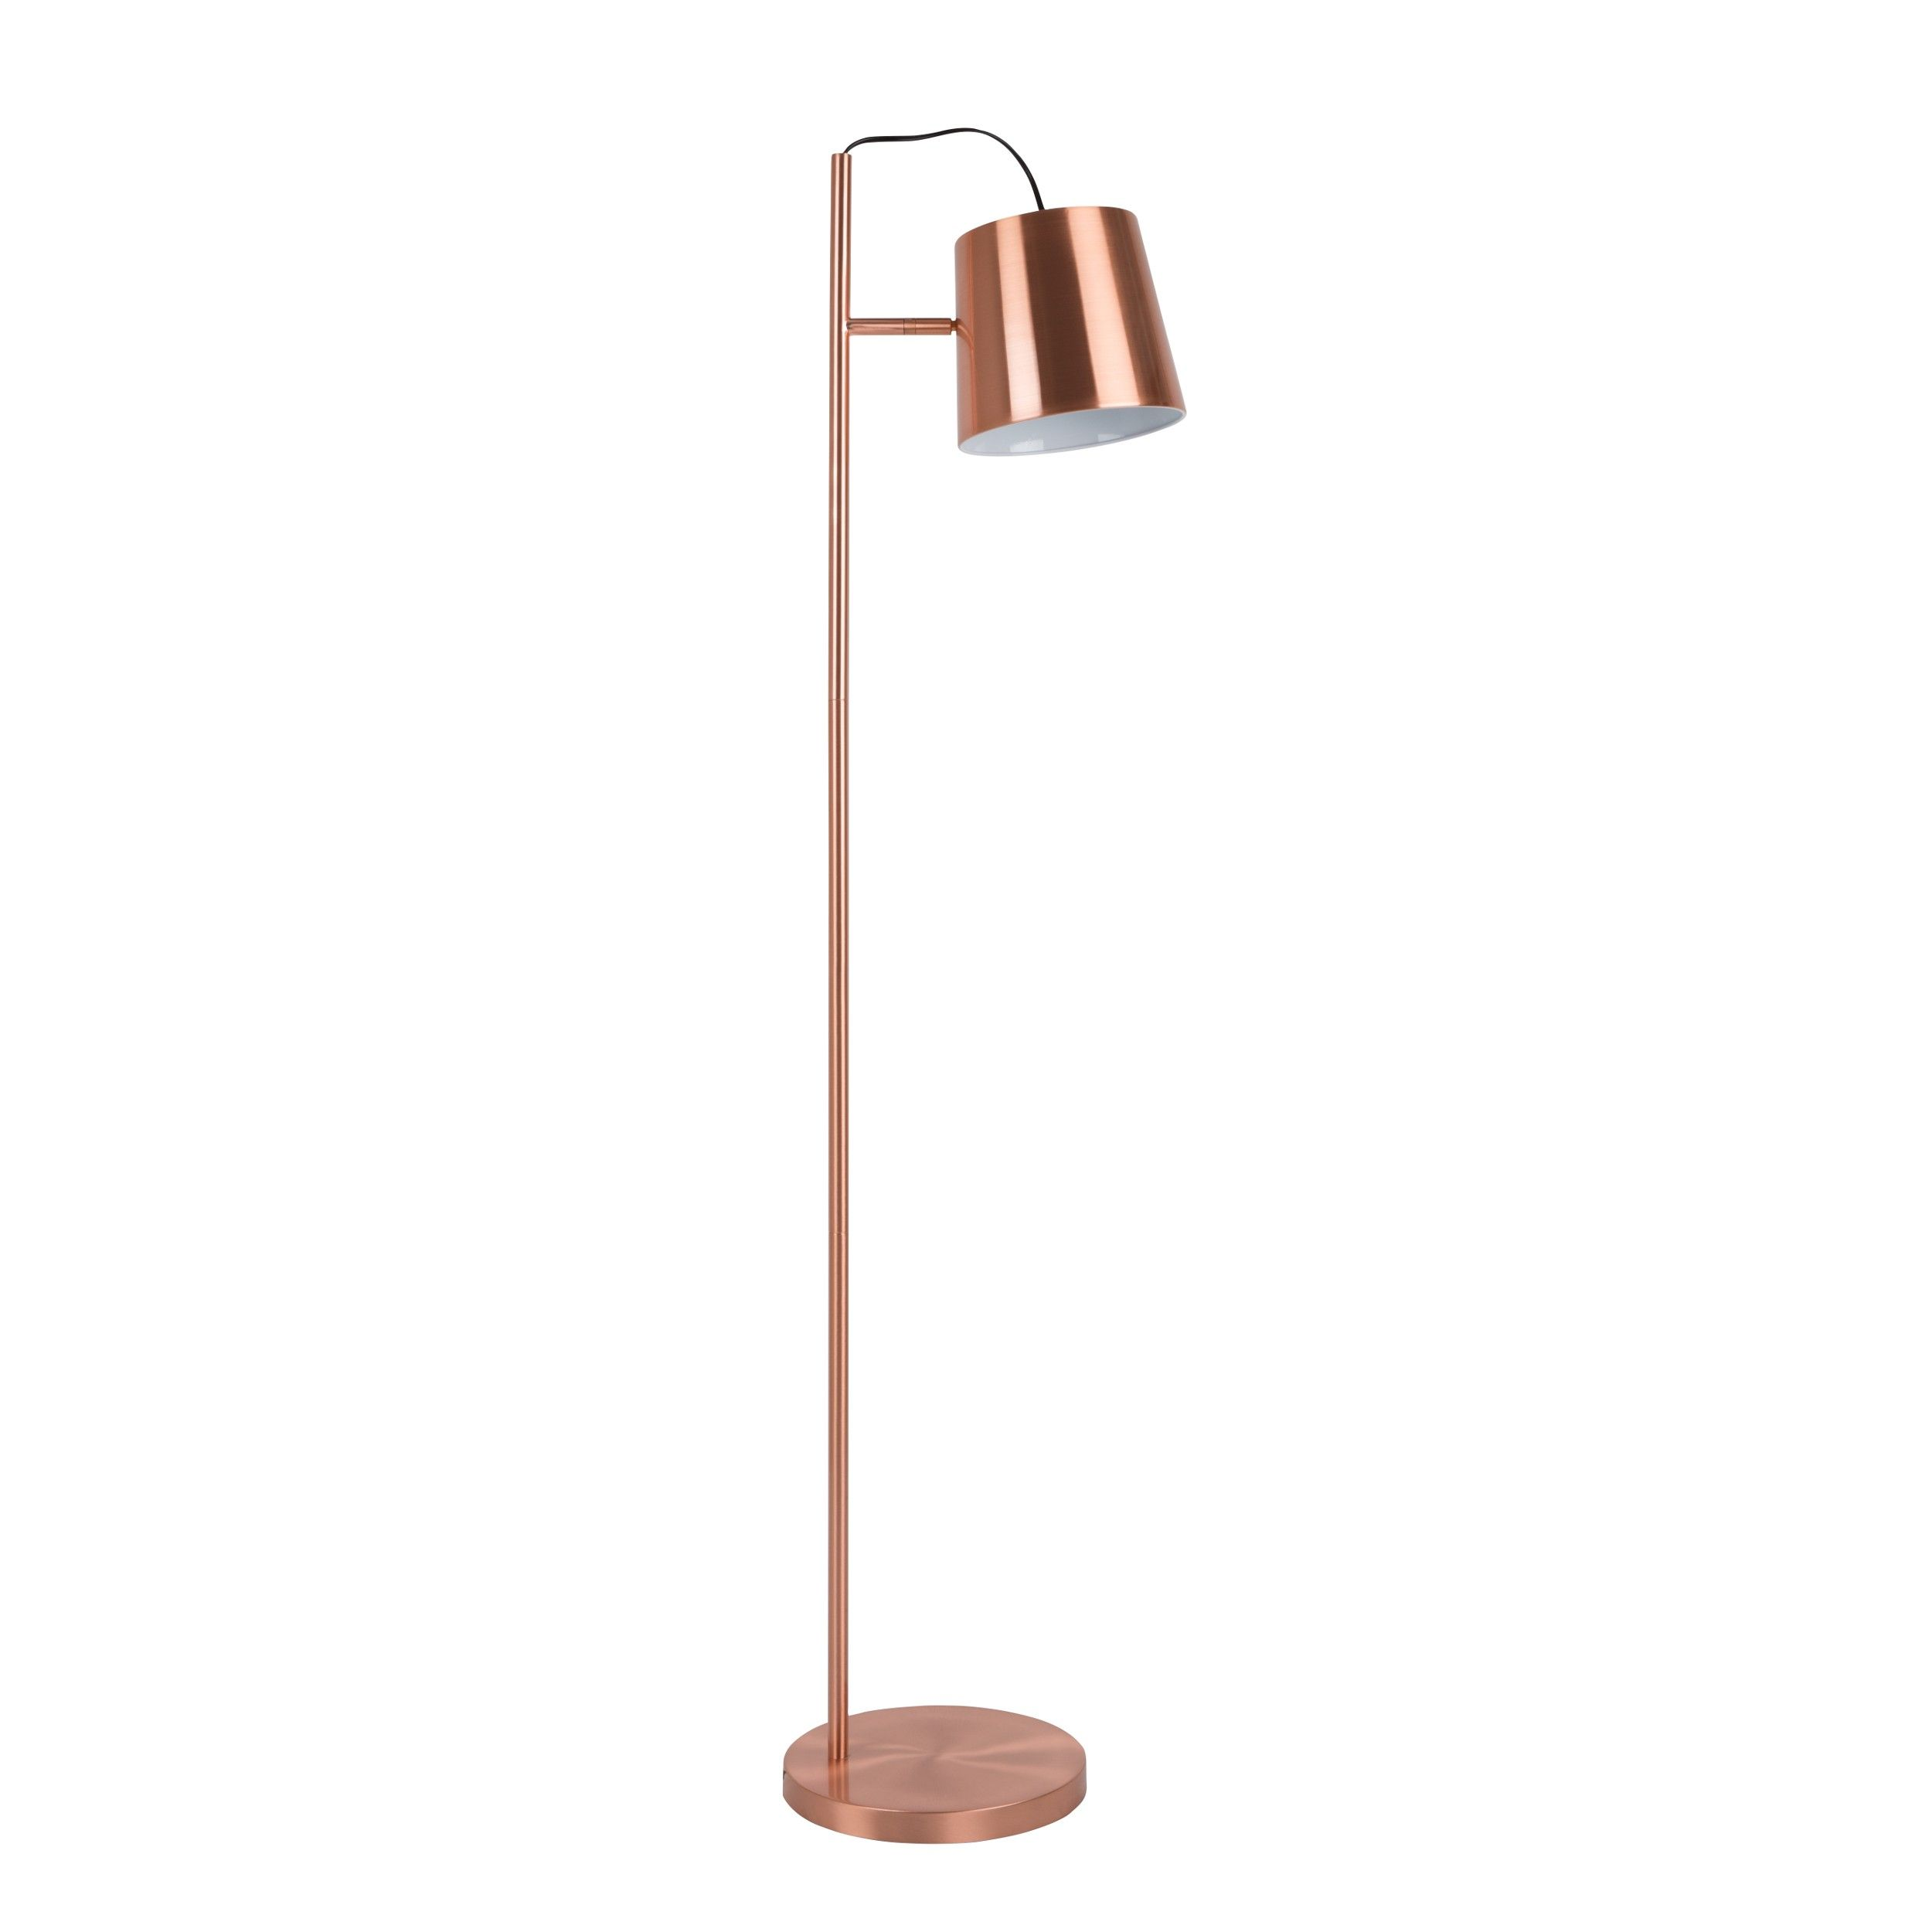 Lighting Plus Table Lamps Nz